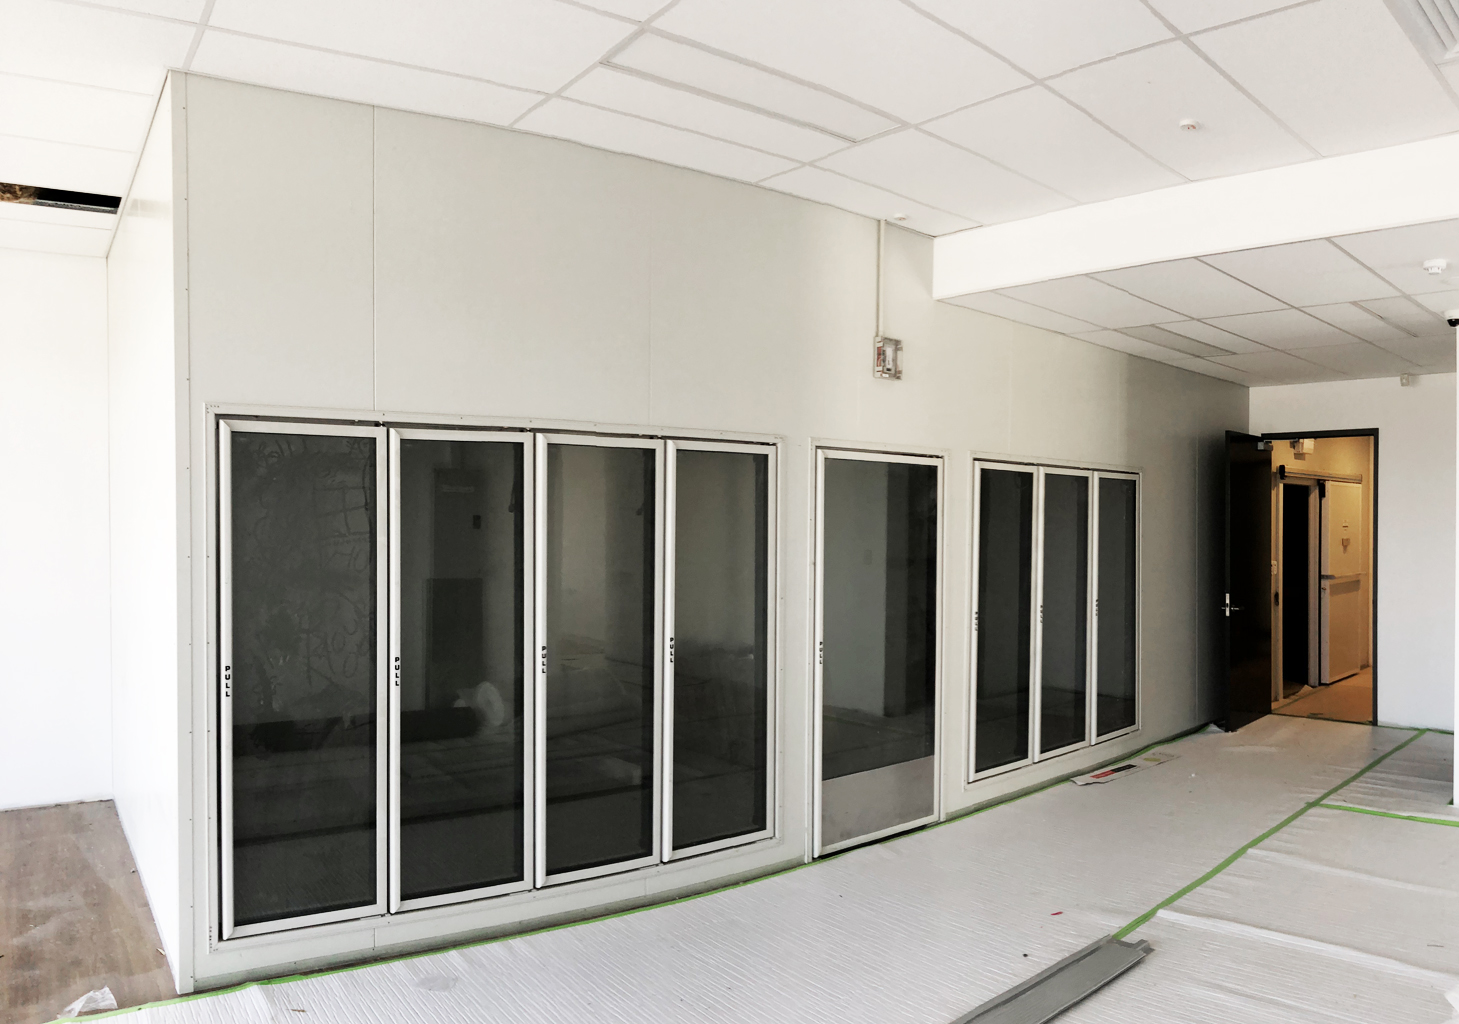 Ingot_Hotel_Display_Refrigerated_Coldroom.jpg